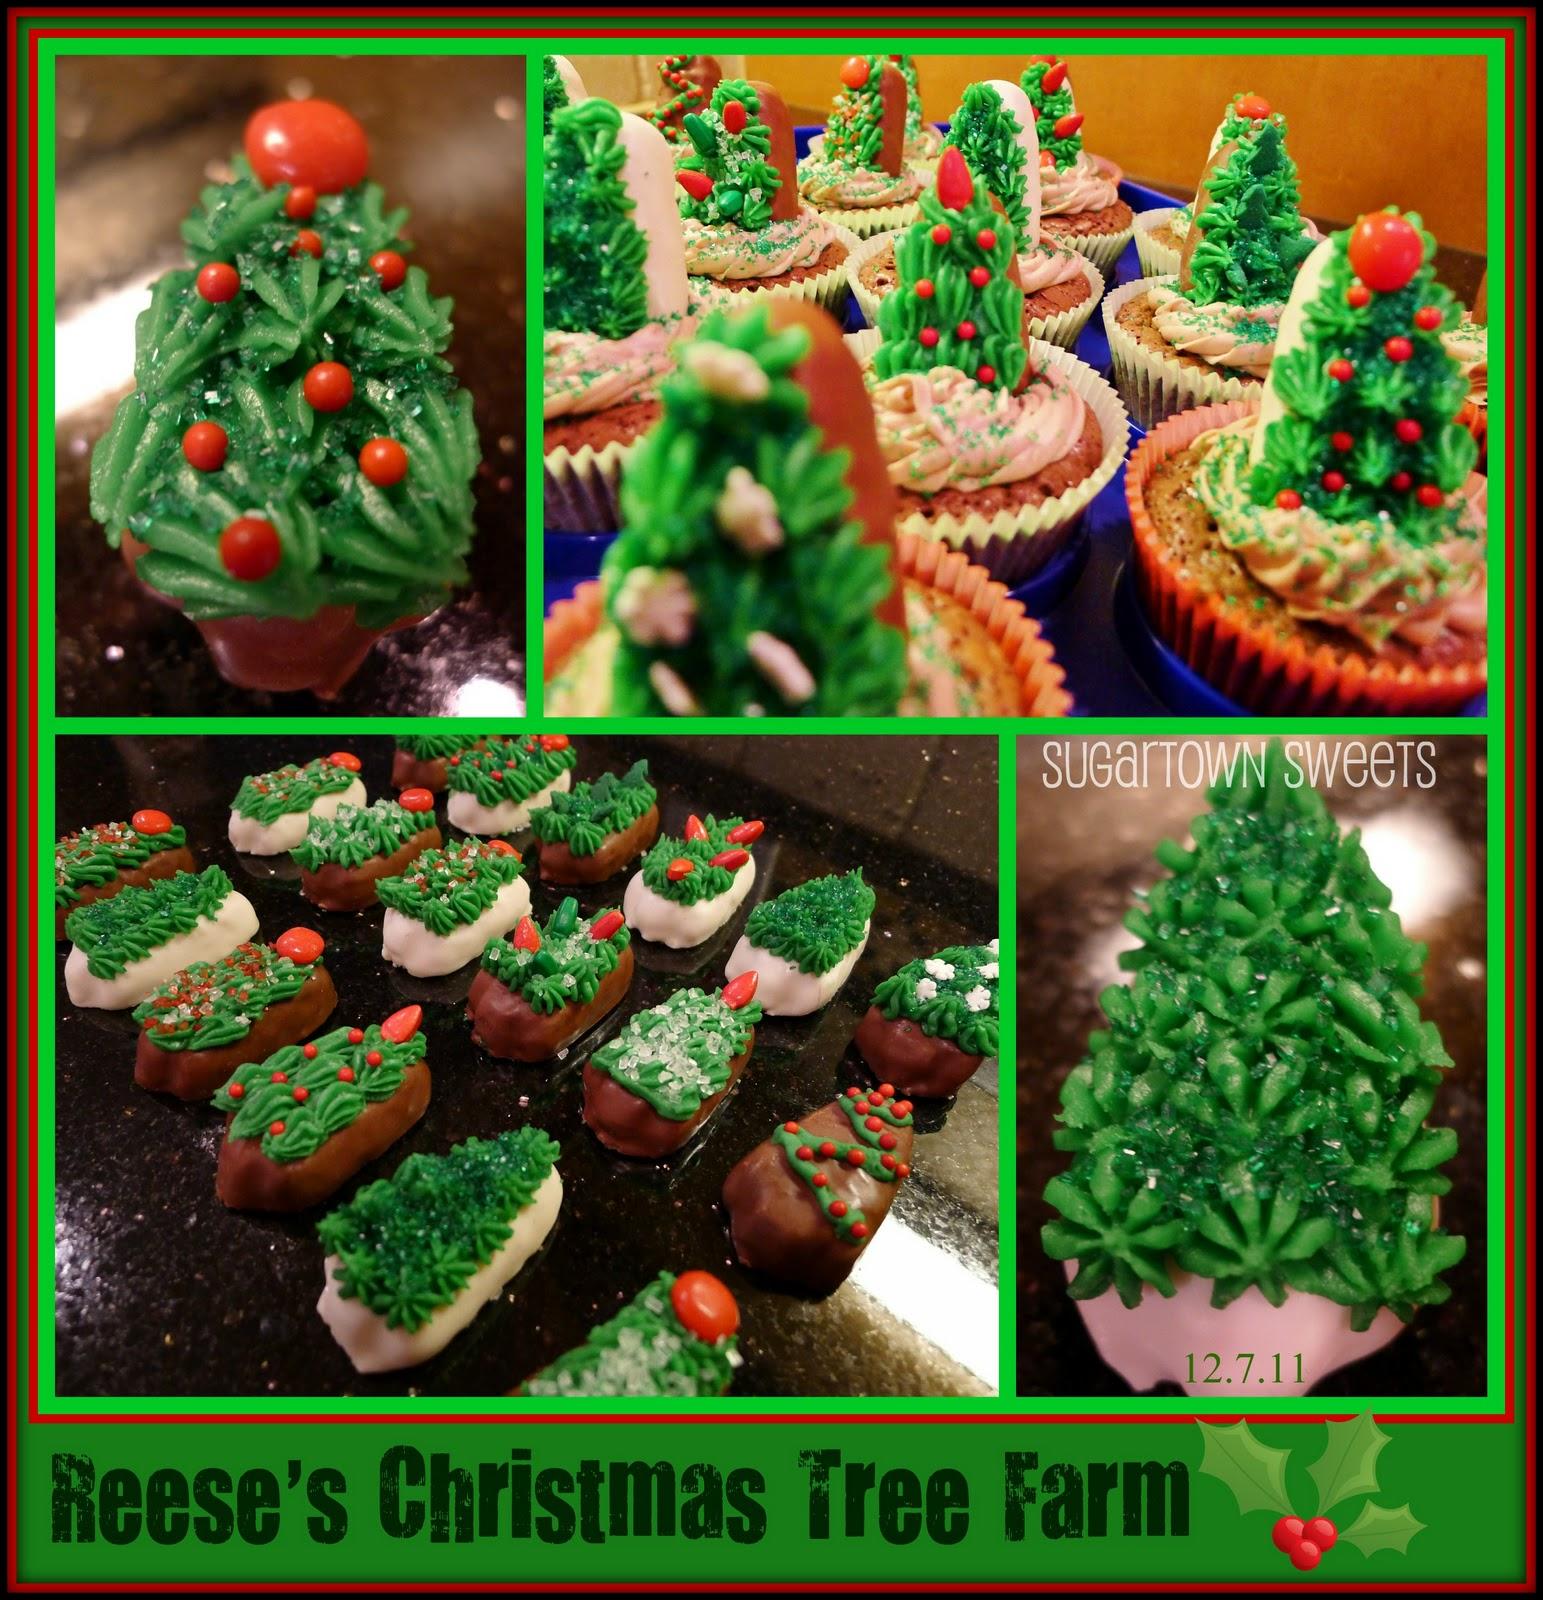 Water And Sugar For Christmas Tree: Sugartown Sweets: Reese's Christmas Tree Farm